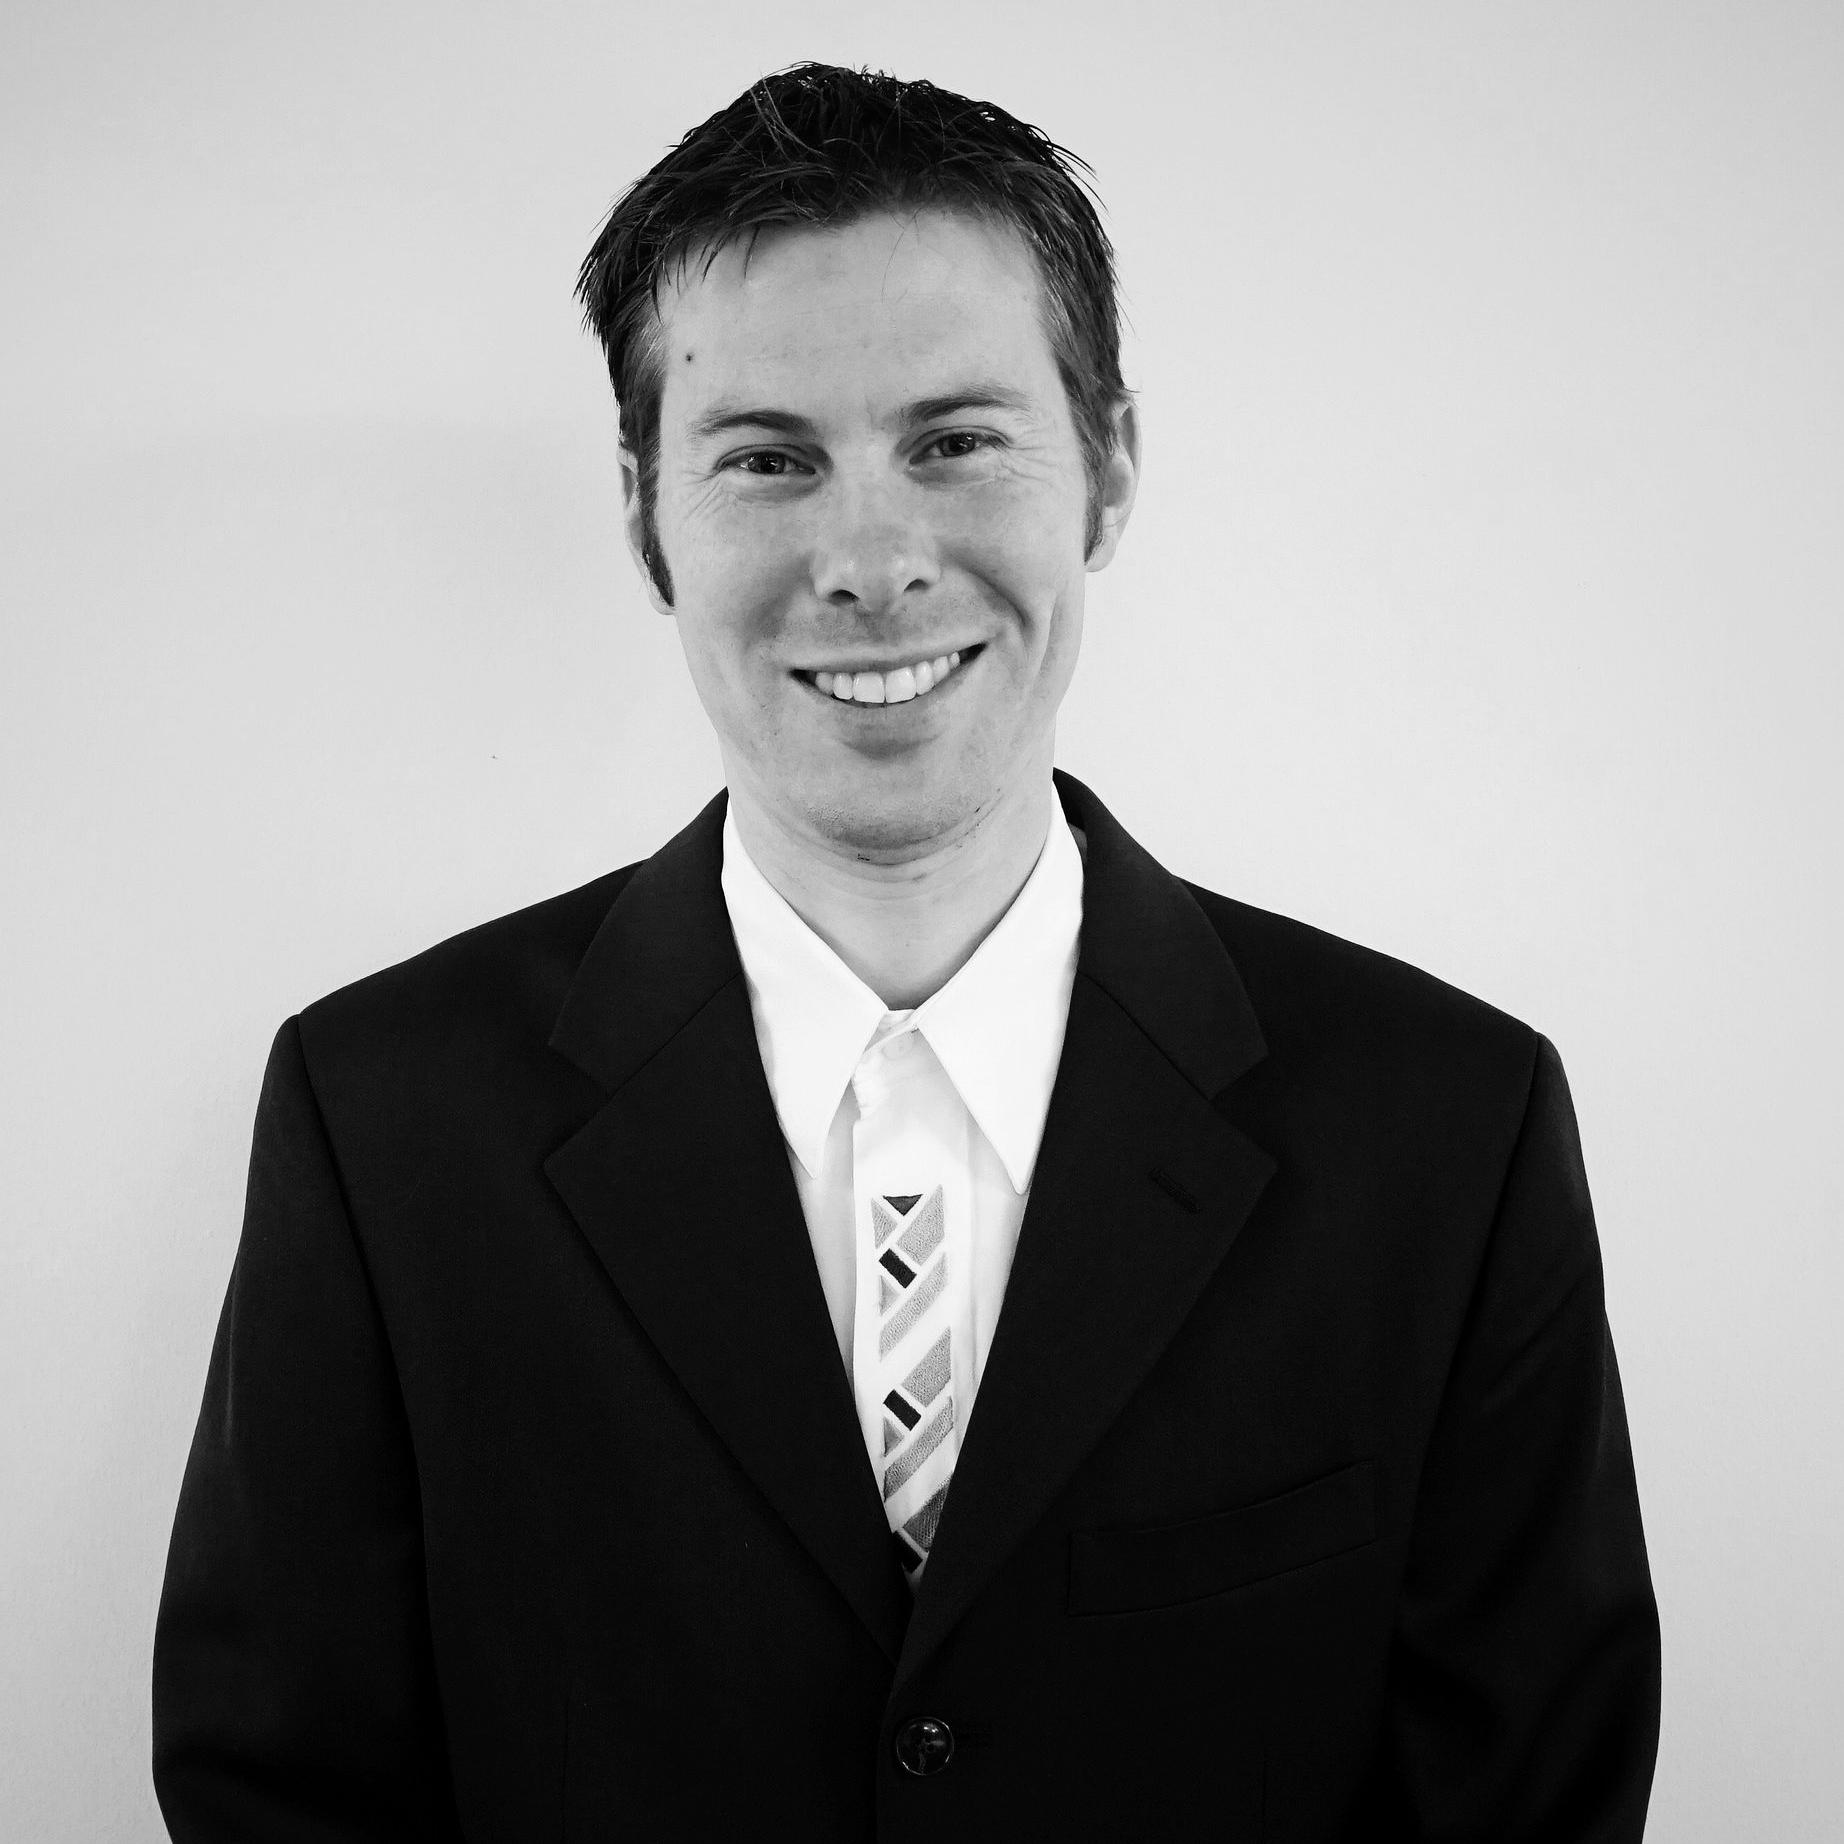 MATT BERGHEGER   Startup • Commissioning   mbergheger@laiweb.net  314-606-6459